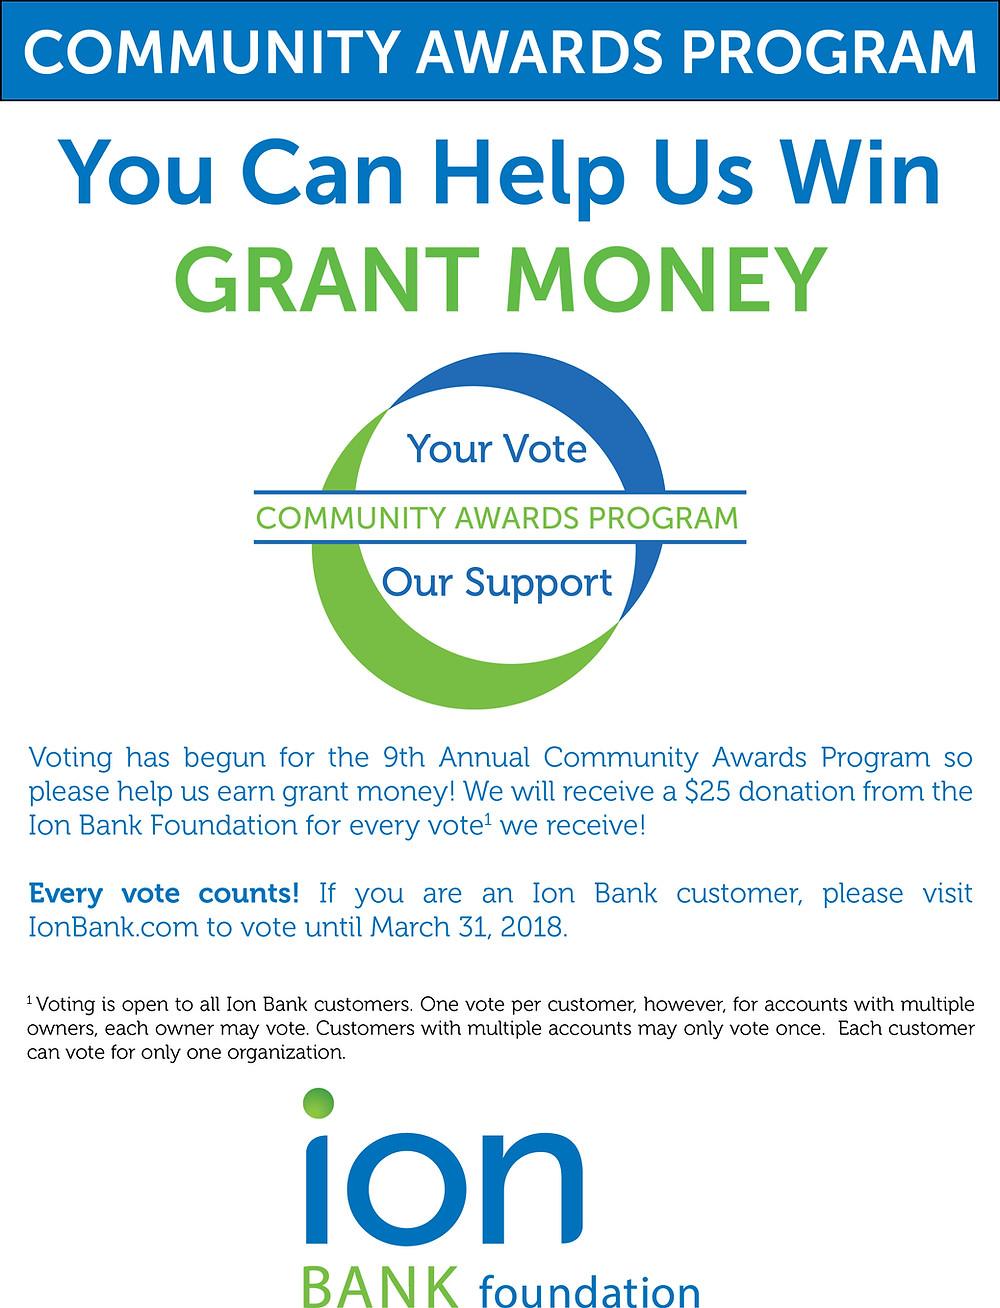 Community Awards Program